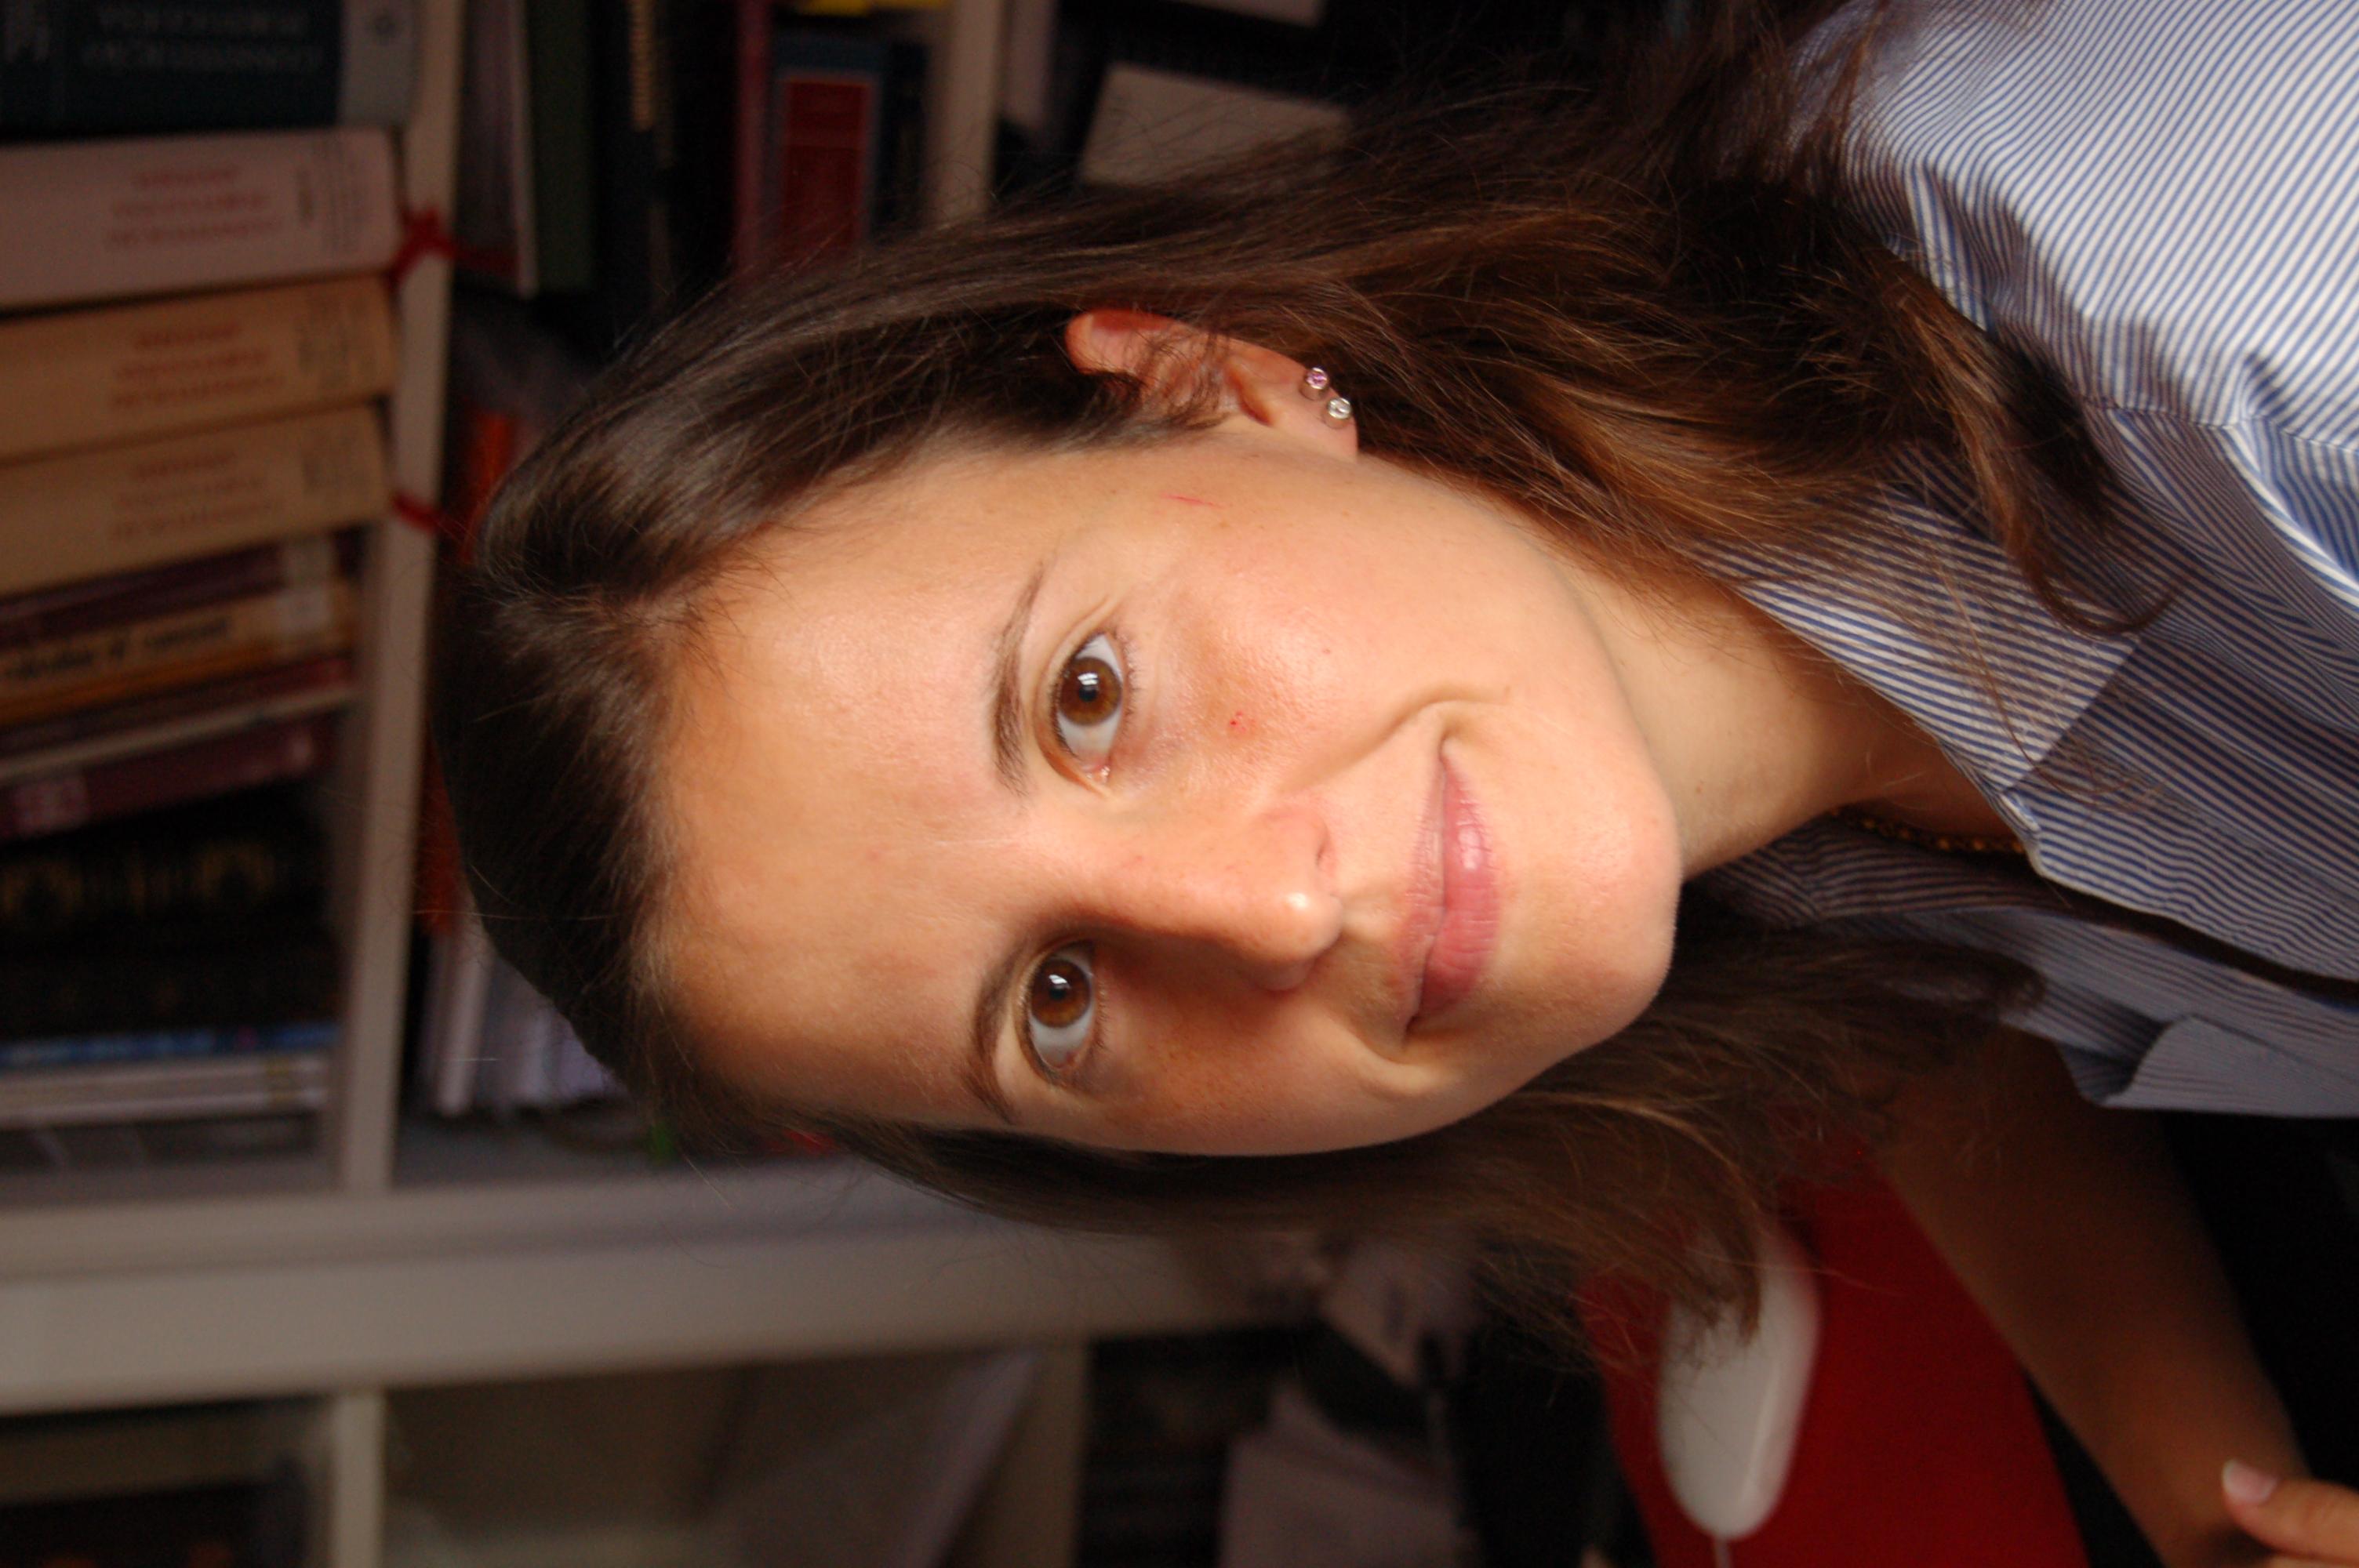 Maria d'Oliveira Martins